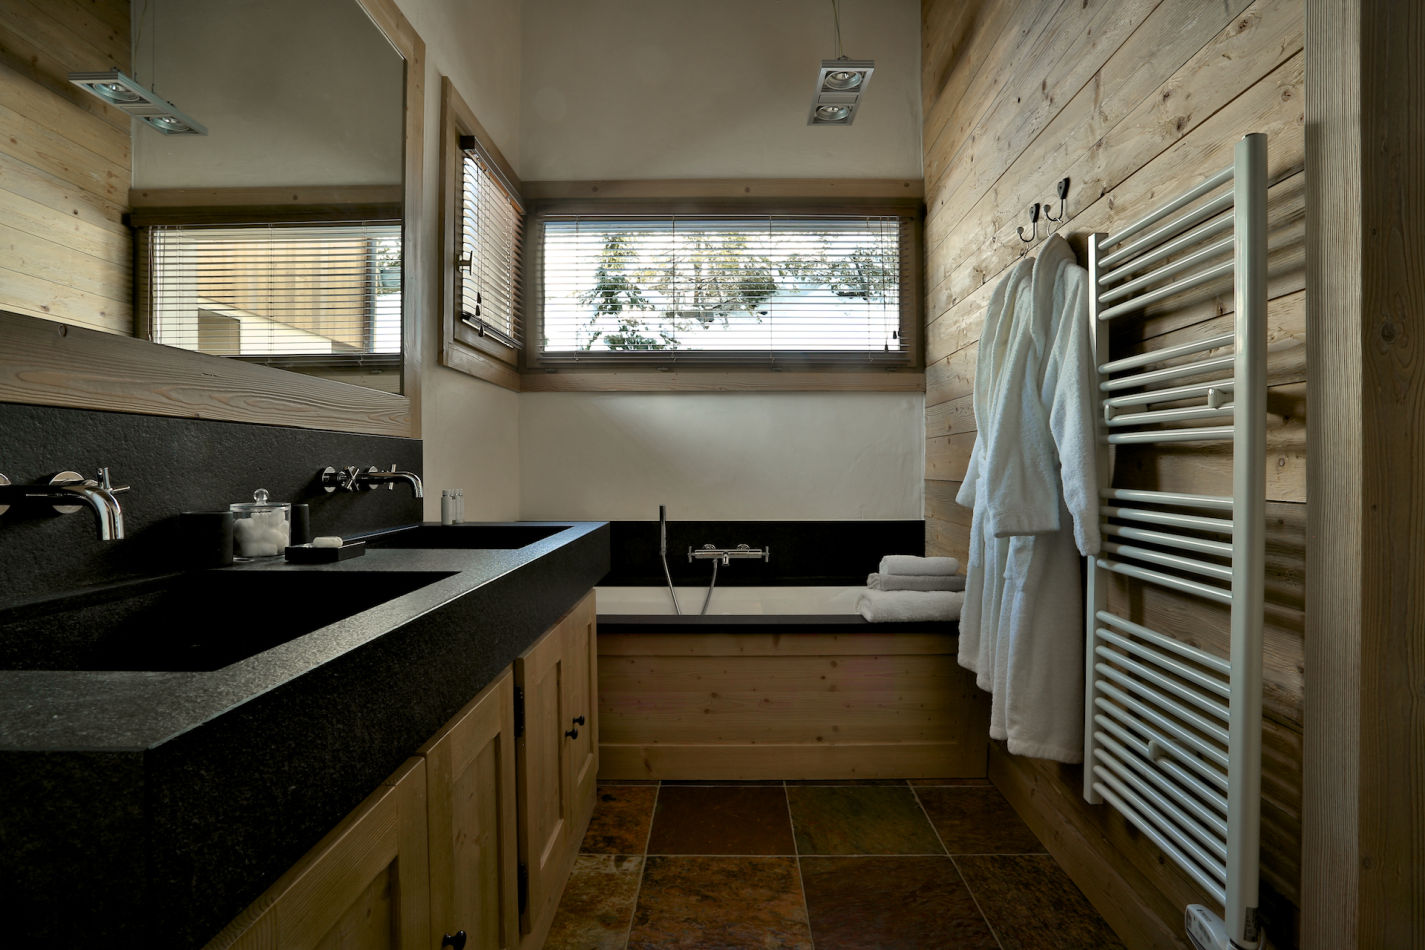 bedroom-1-bathroom-image-93